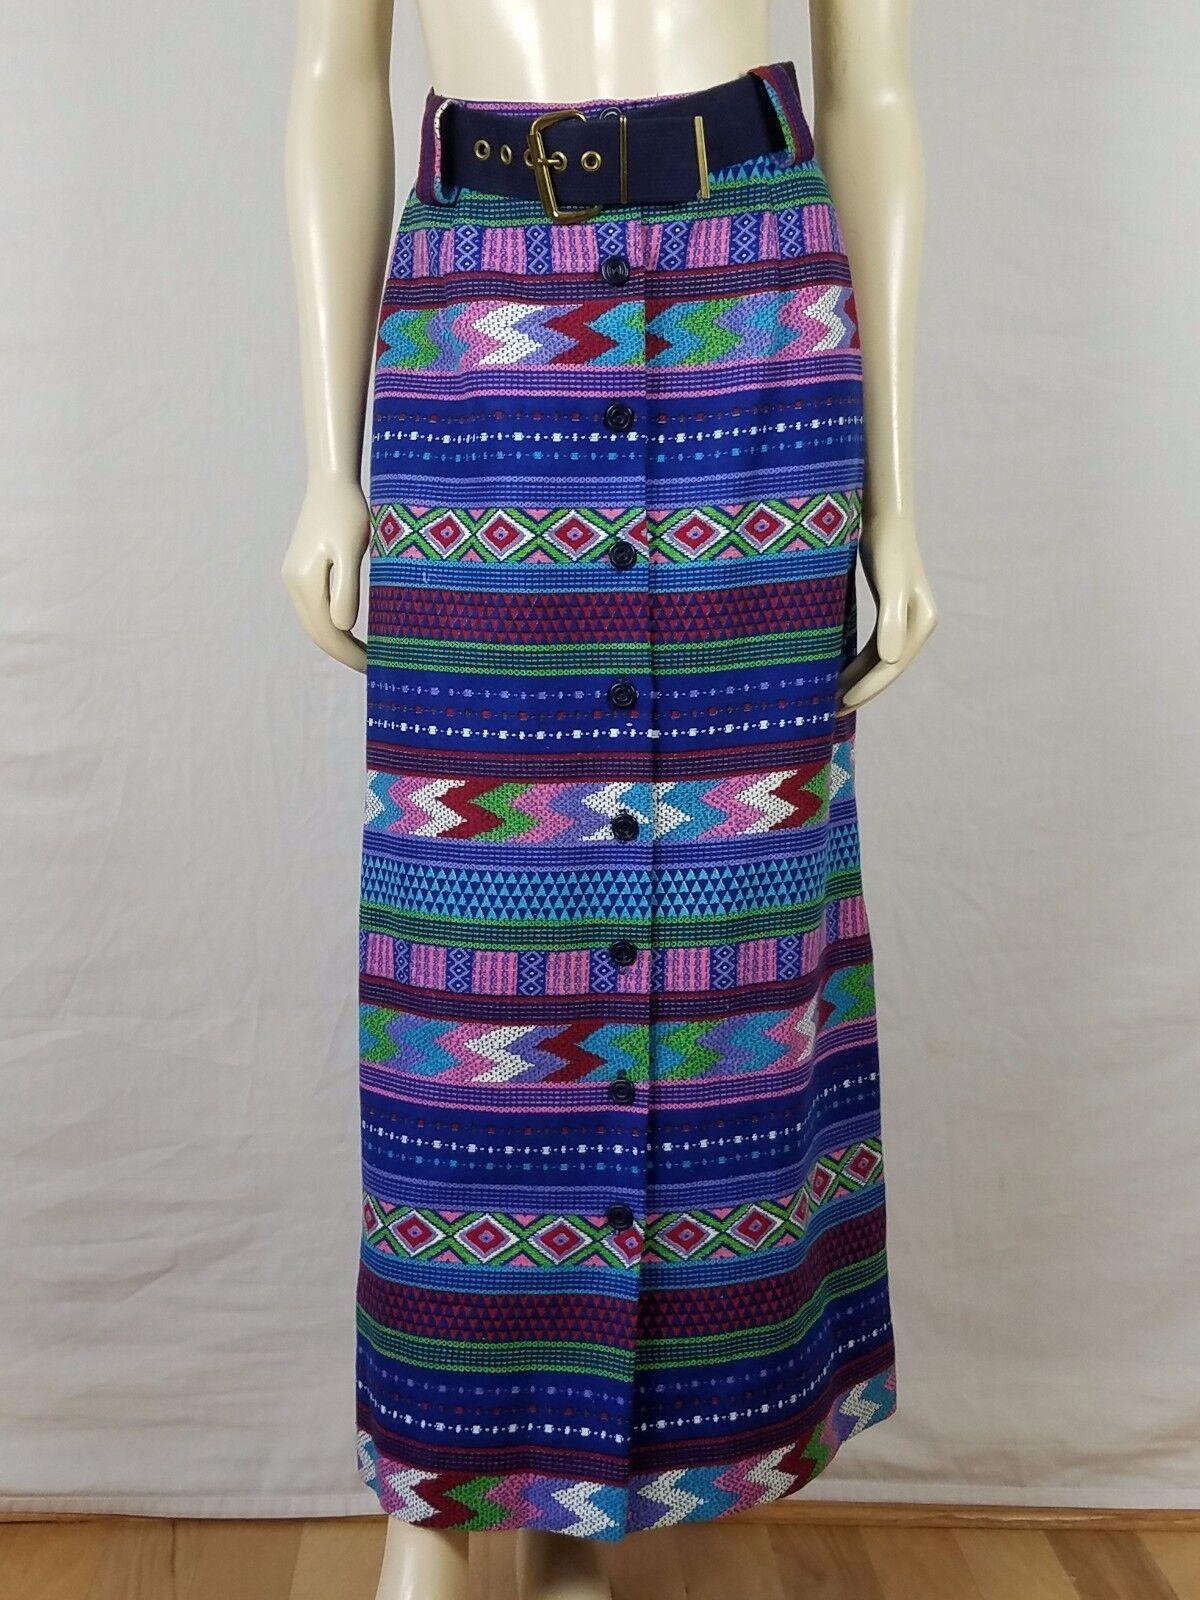 Vintage PRESTIGE OF BOSTON Maxi Multi-colord Bohemian skirt Size XS 23 Waist